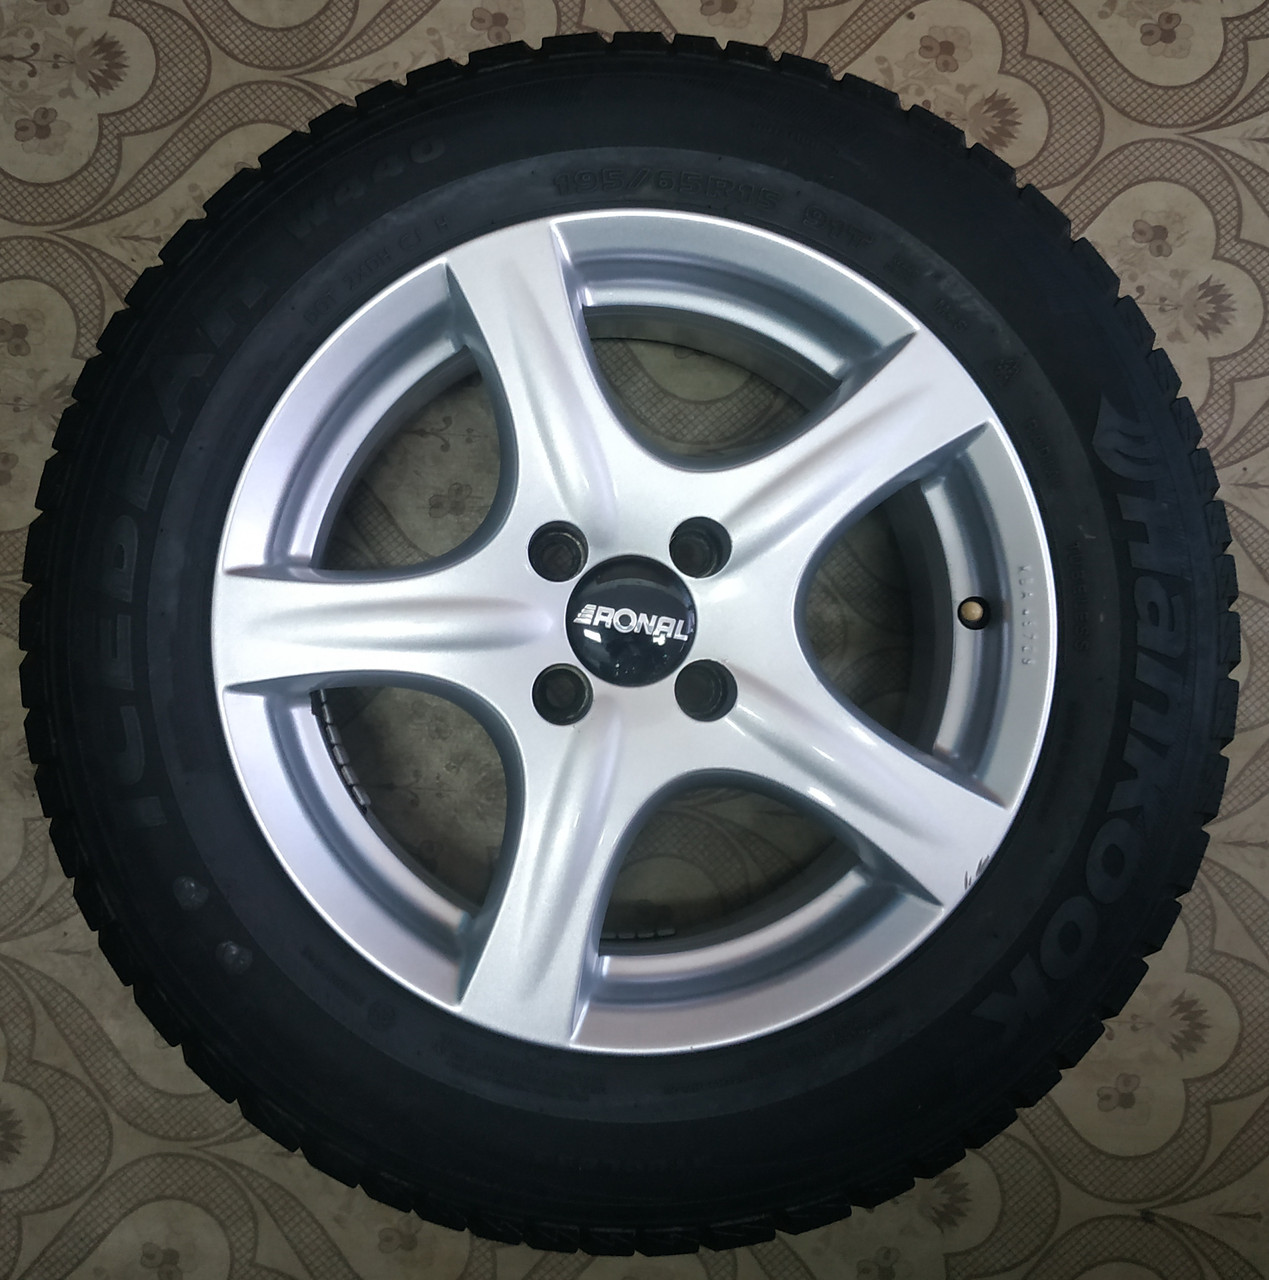 195/65/R15 Ronal Комплект литые диски + шины 4шт. Зима